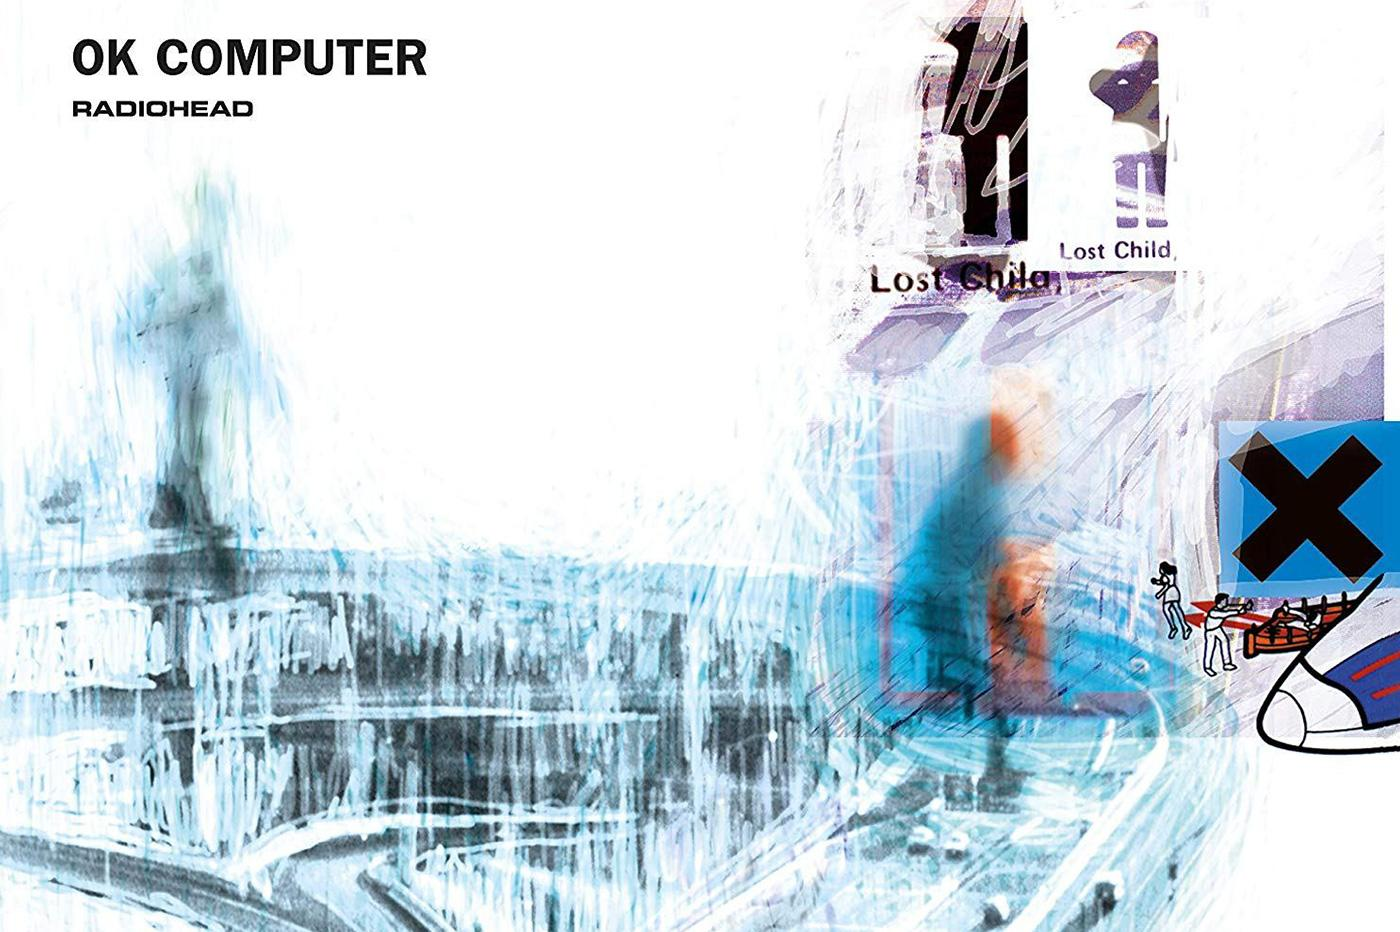 [SPAM] Radiohead